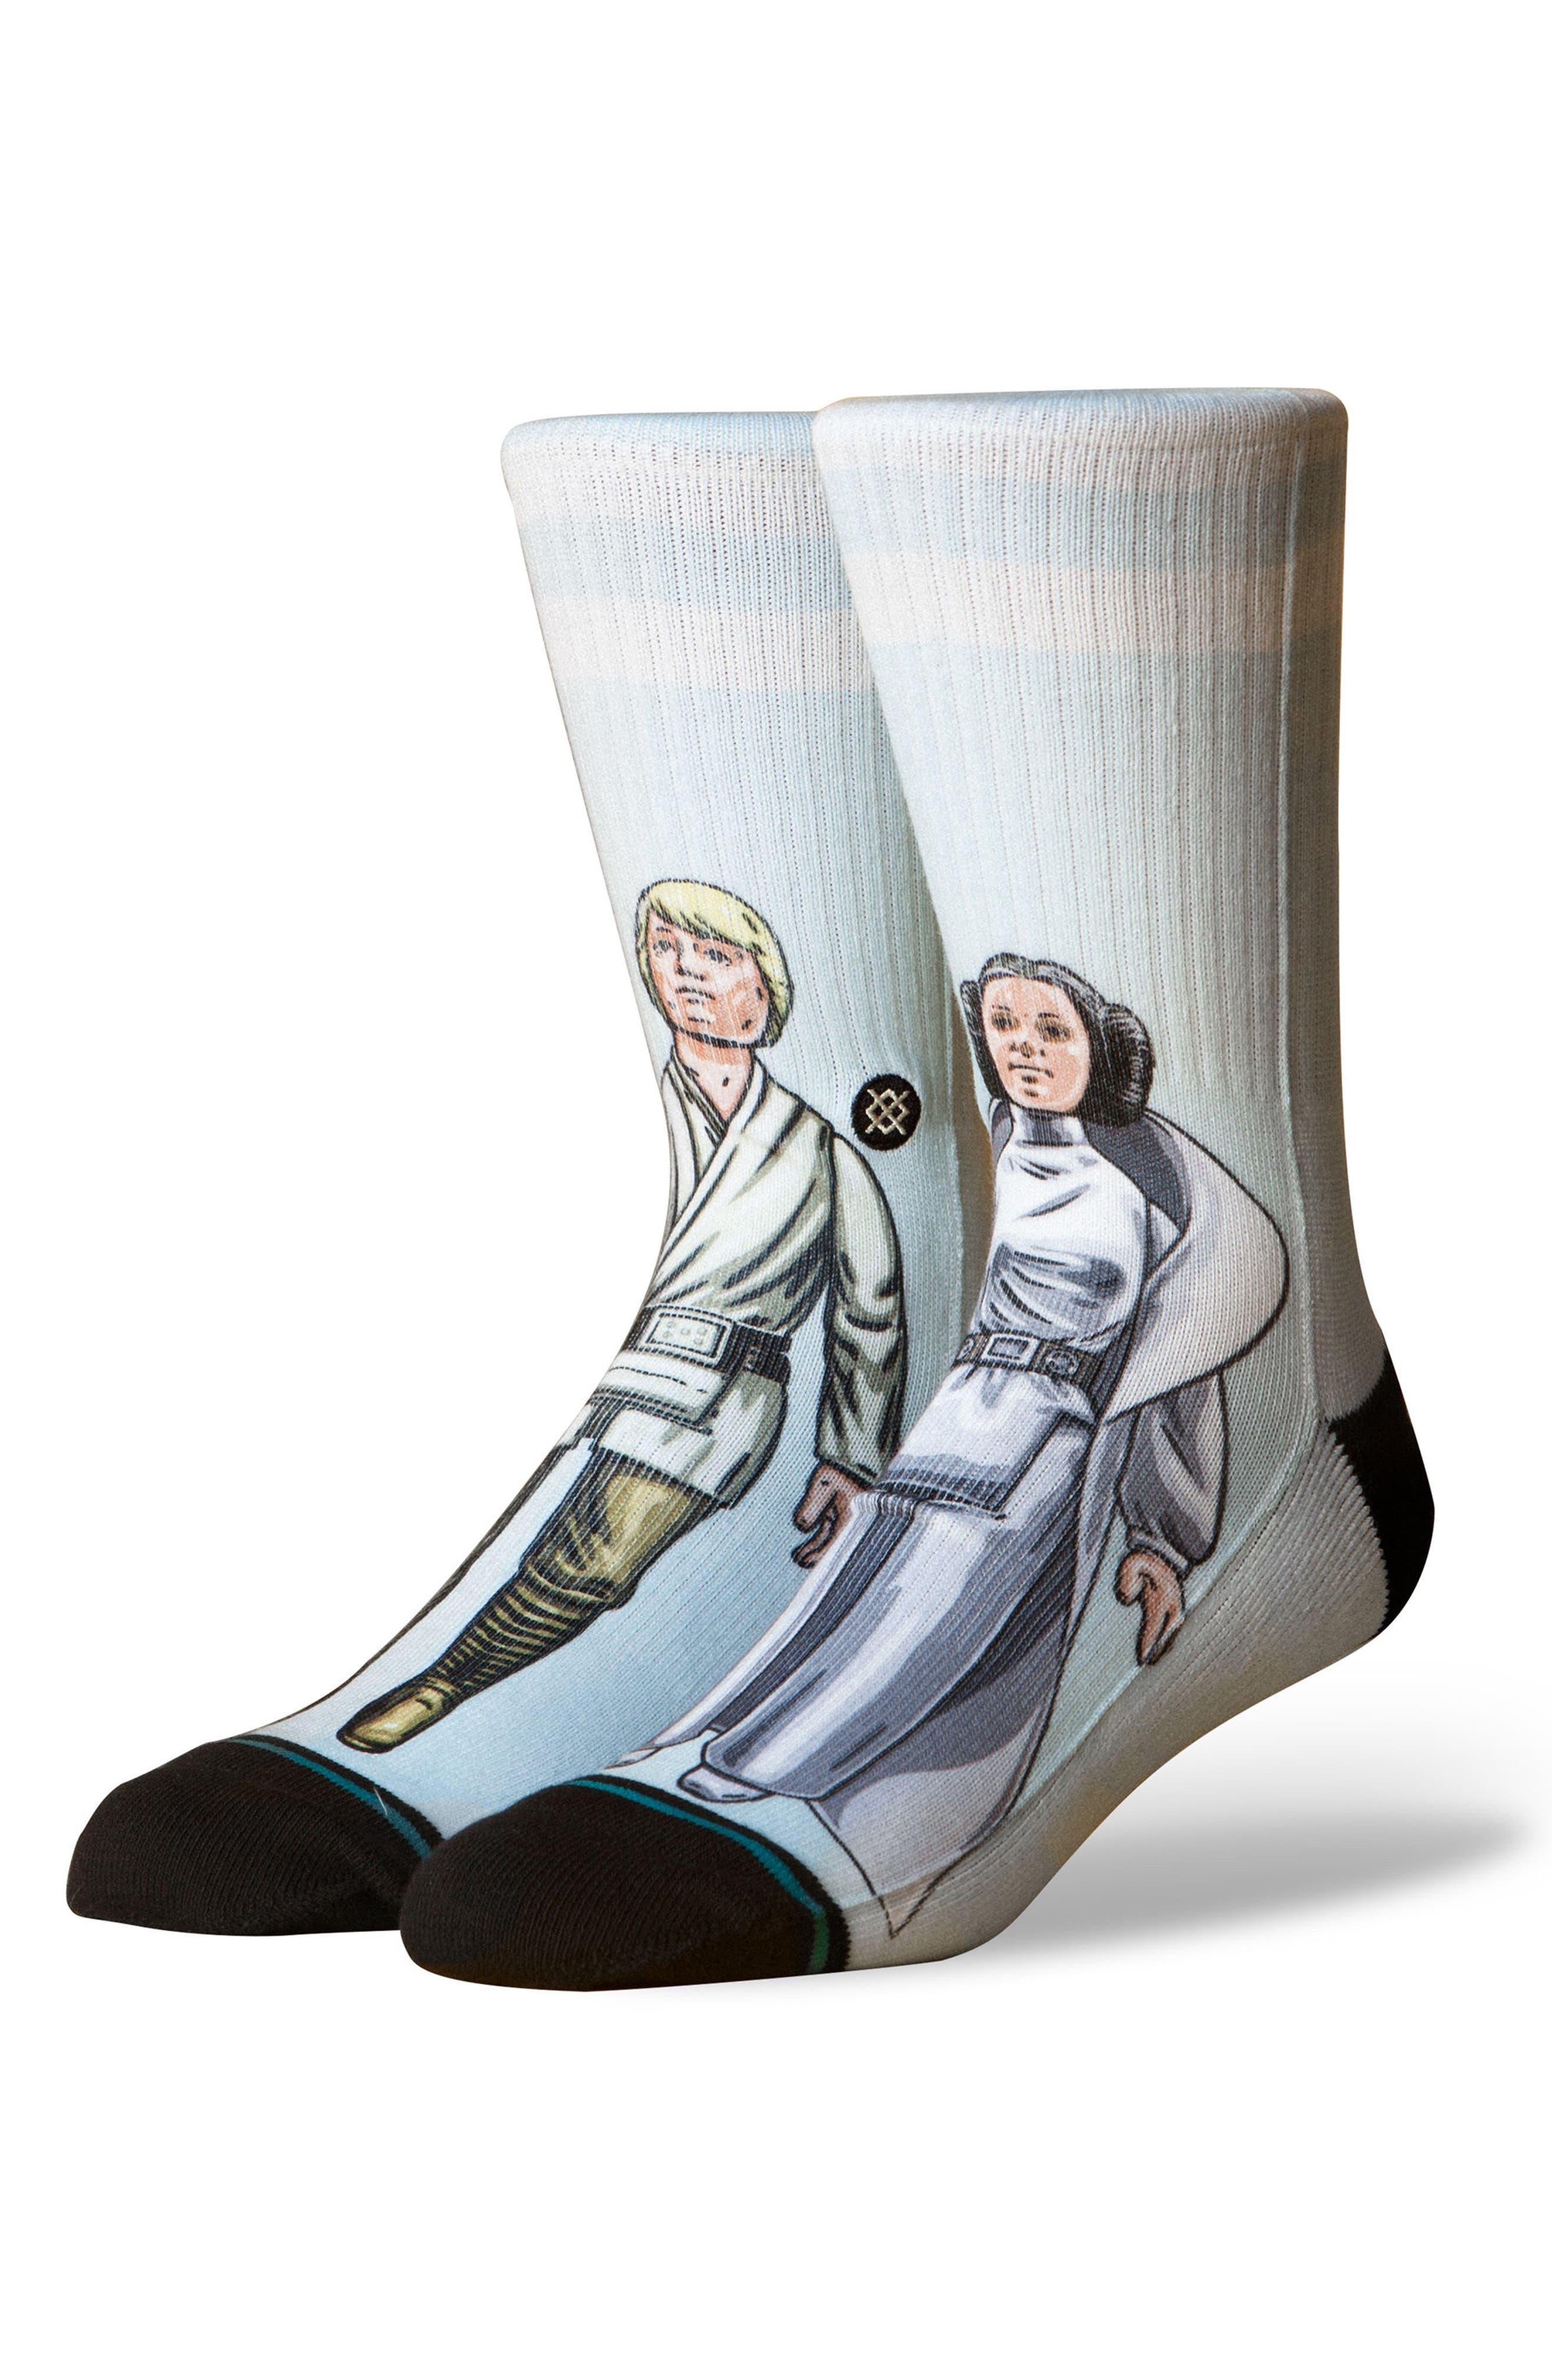 Star Wars<sup>™</sup> Family Force Socks,                         Main,                         color, Aqua